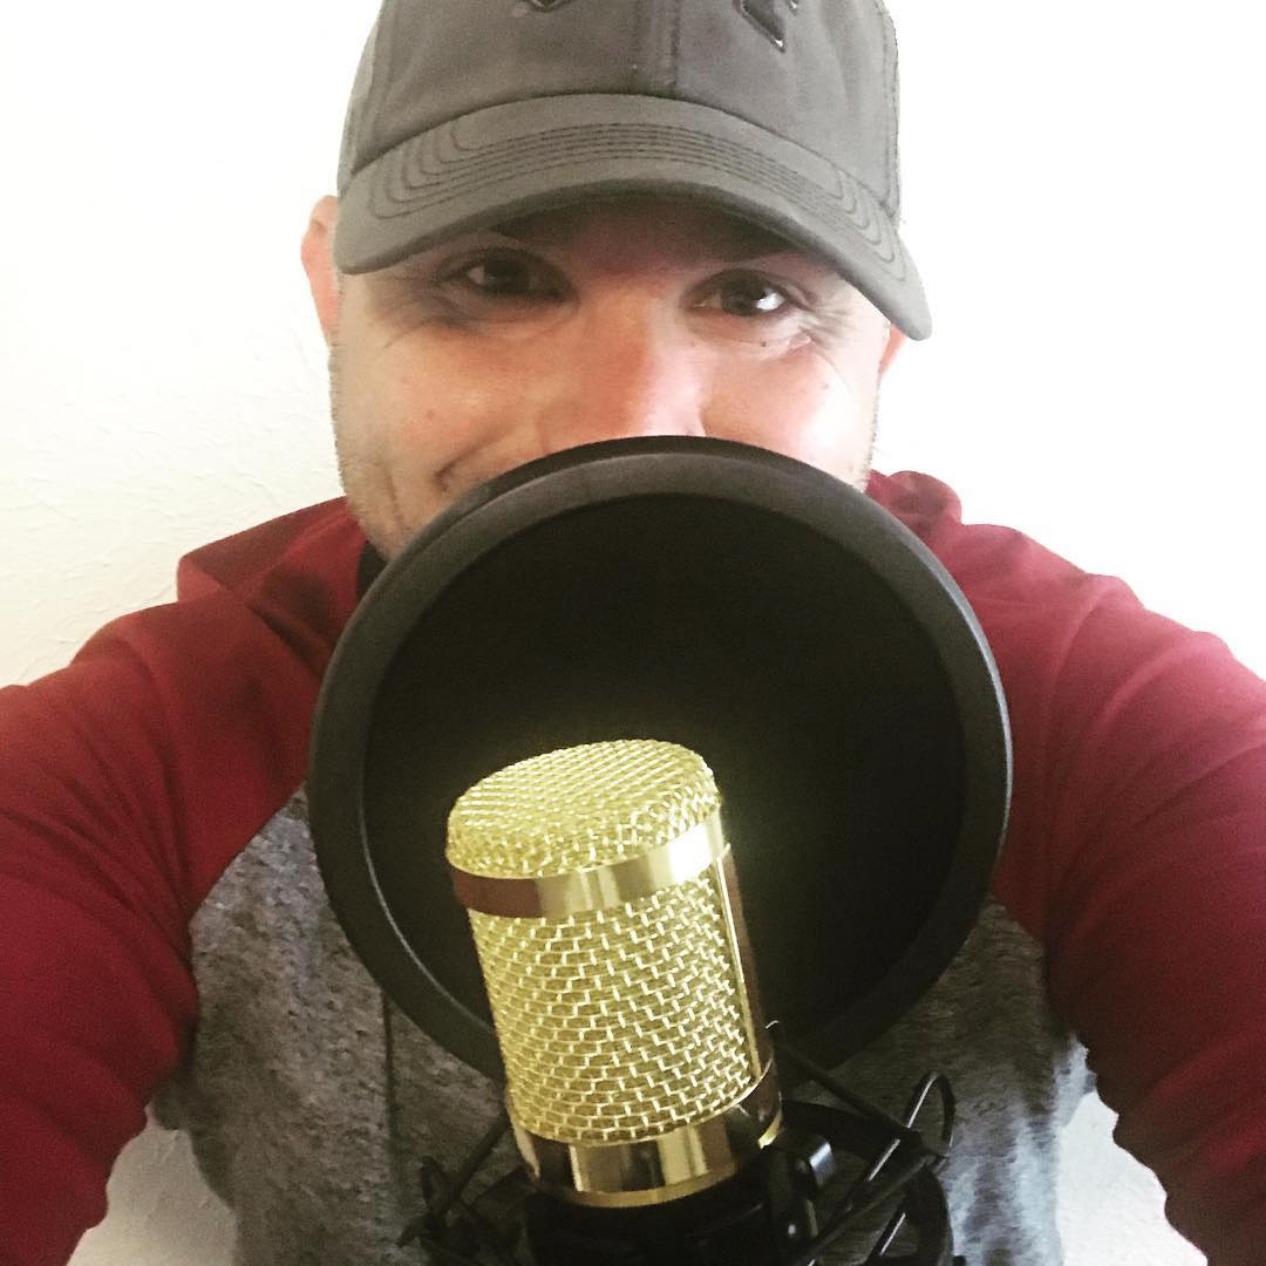 Justin Sliva behind the mic